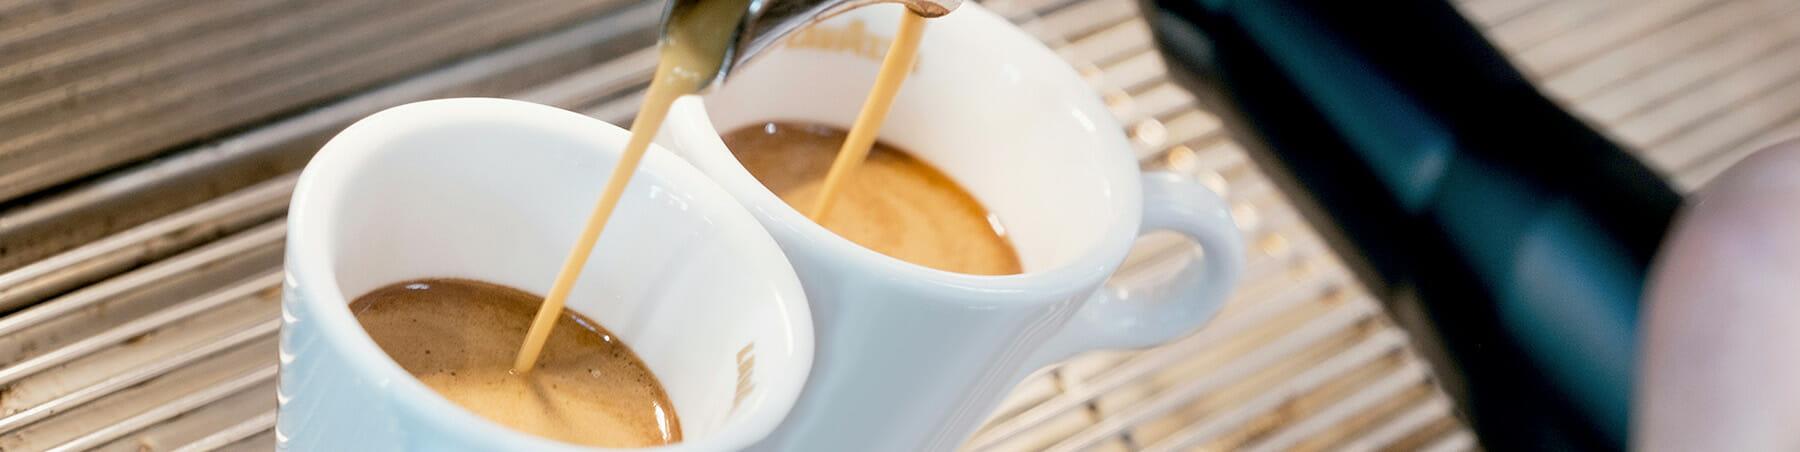 Productos café